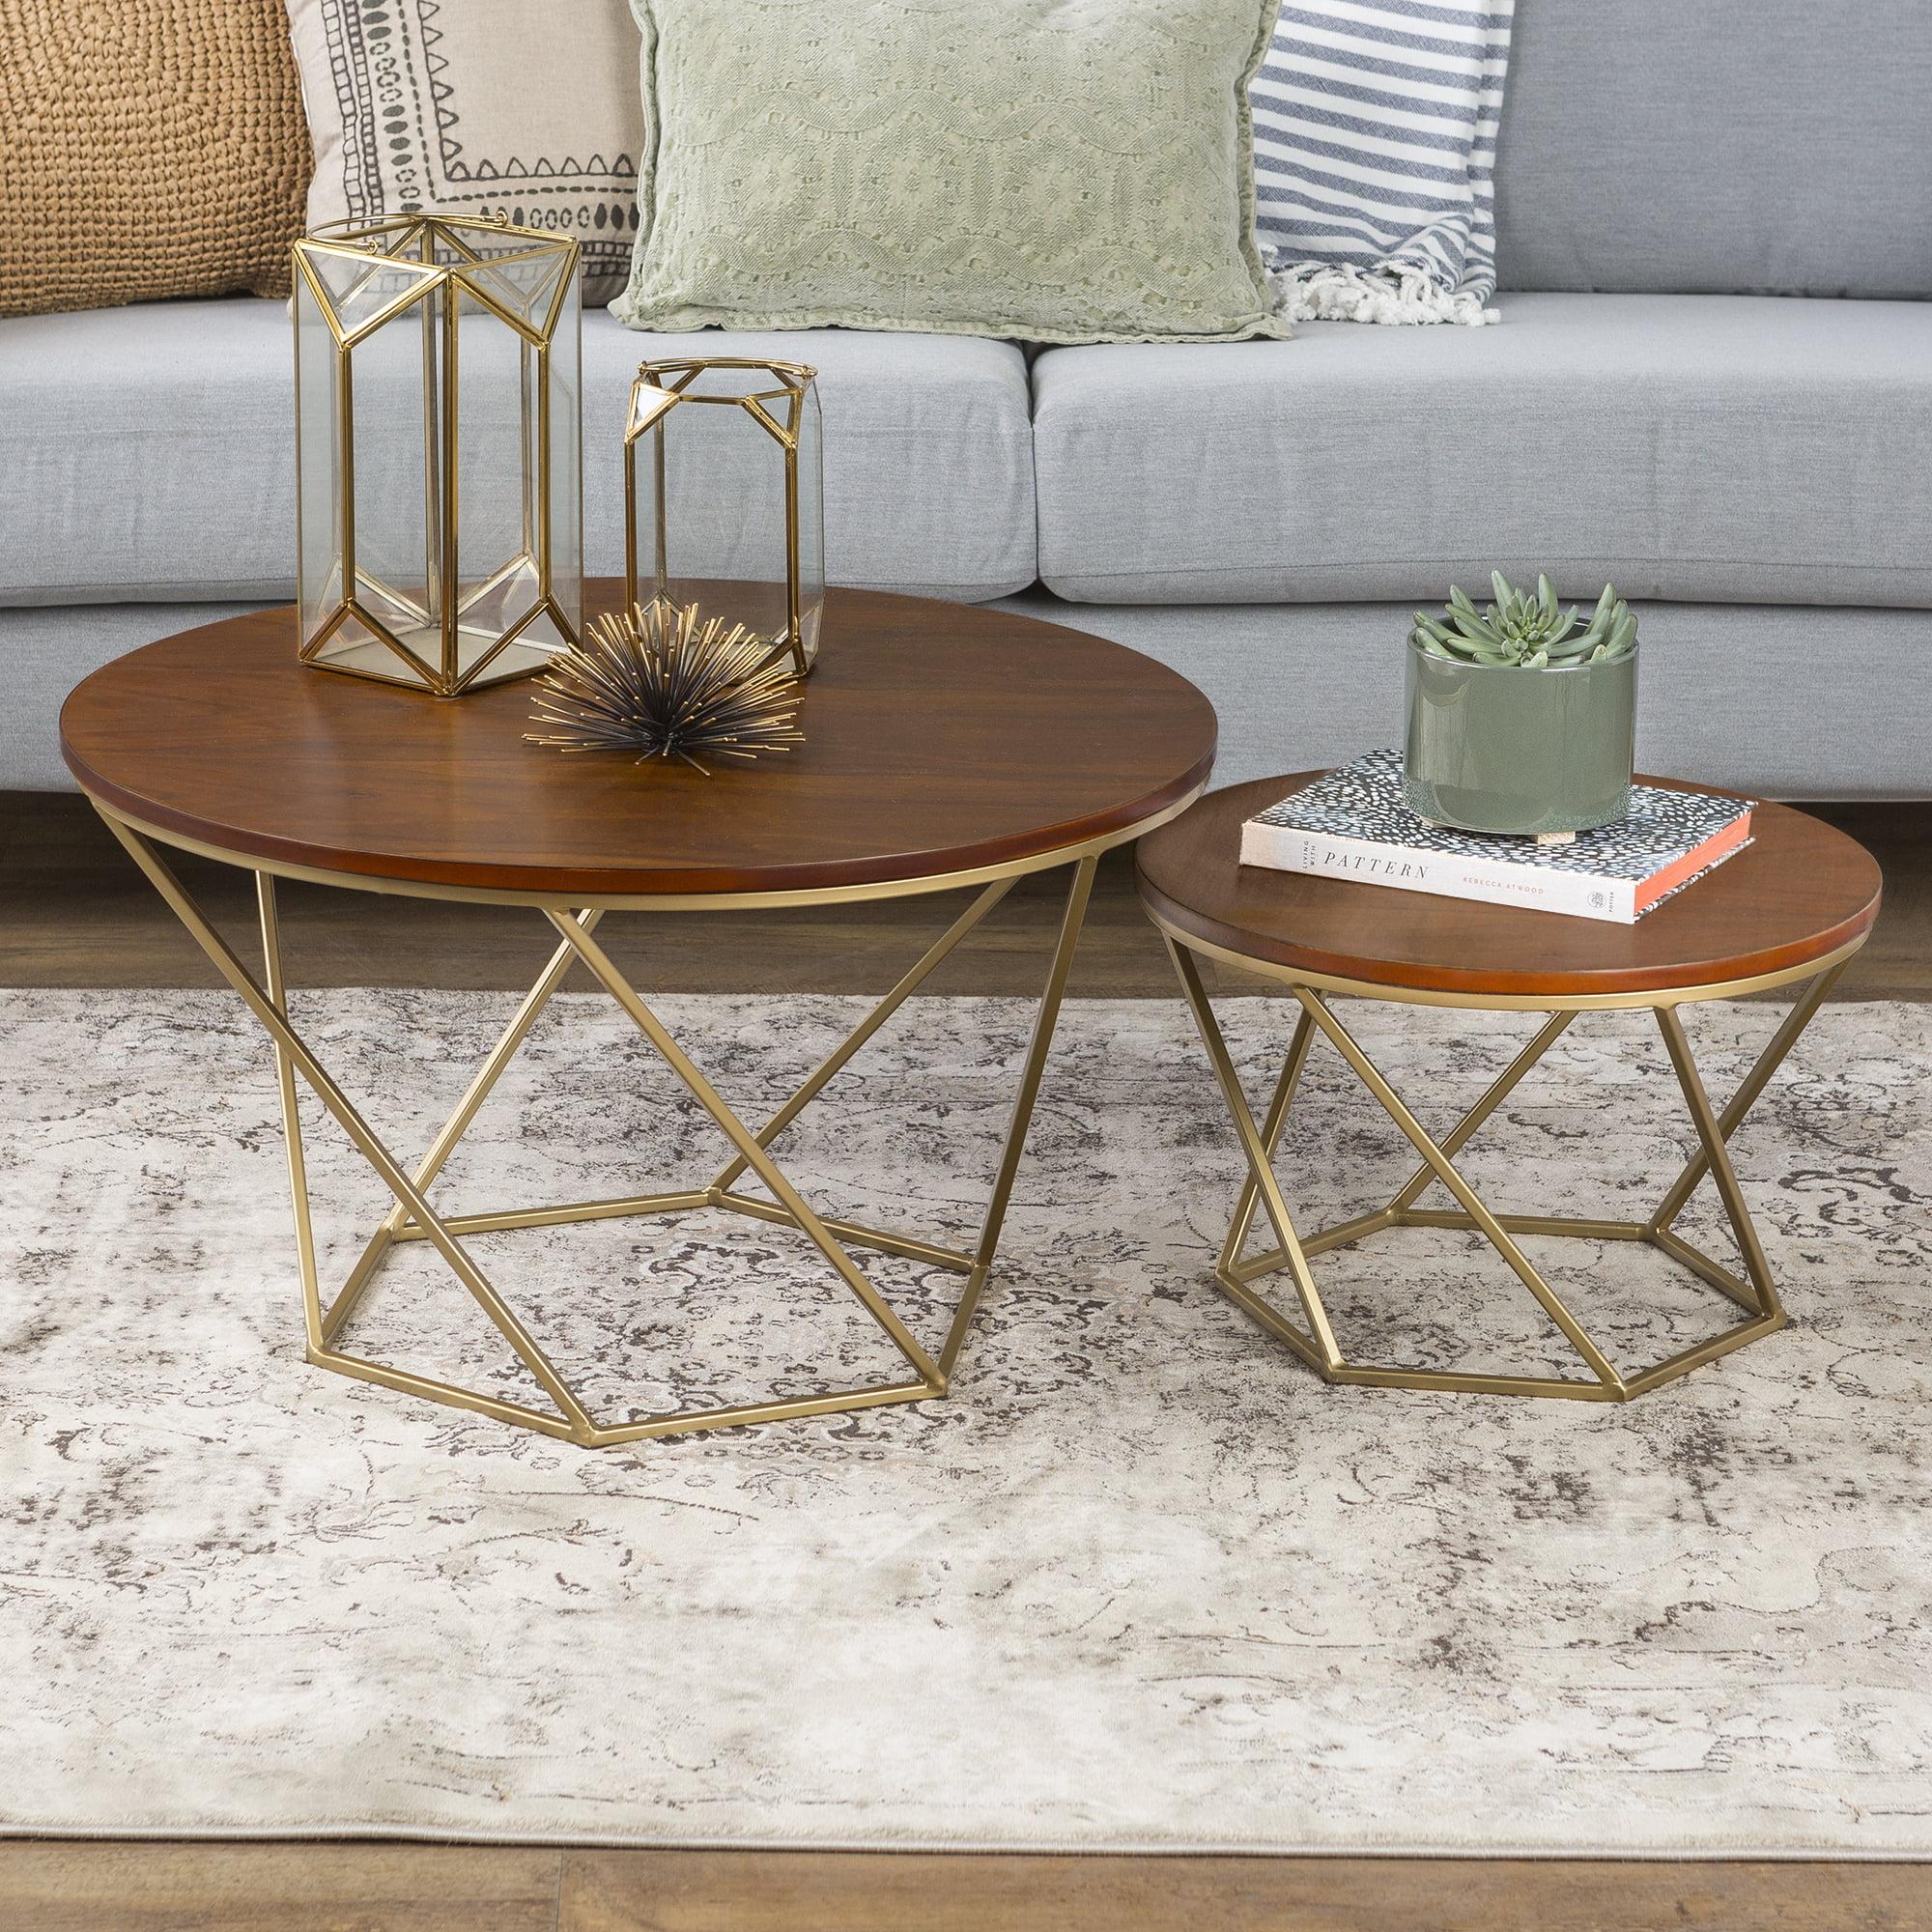 Geometric Wood Nesting Coffee Tables - Walnut/Gold